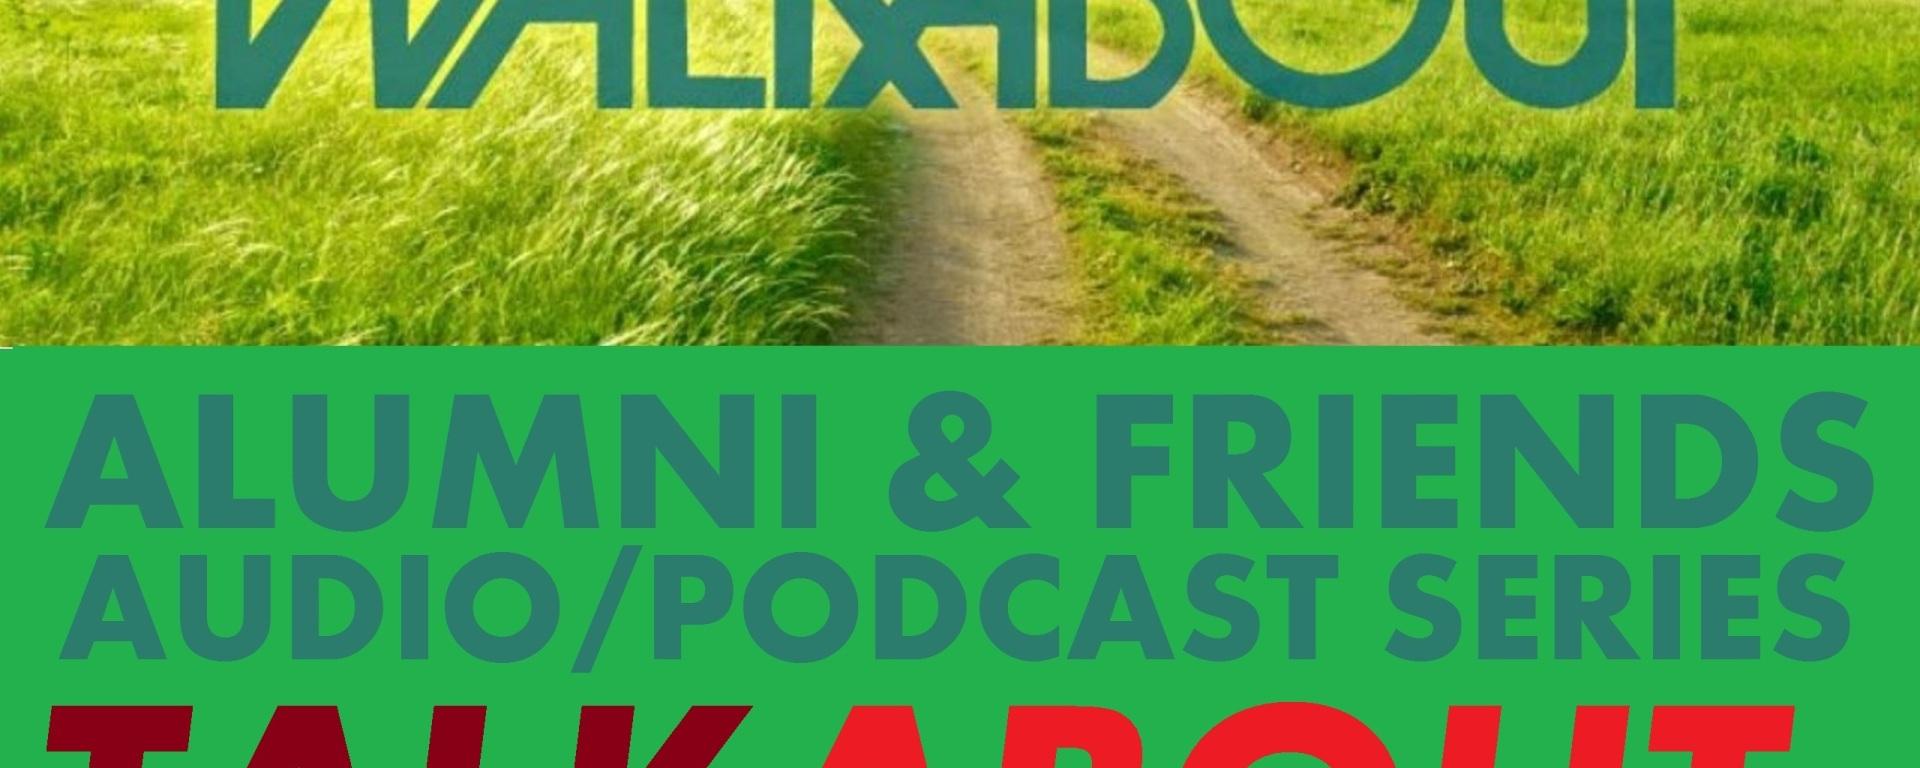 TALKABOUT - Audio-Podcast Series - Walkabout Alumni Association - WAA